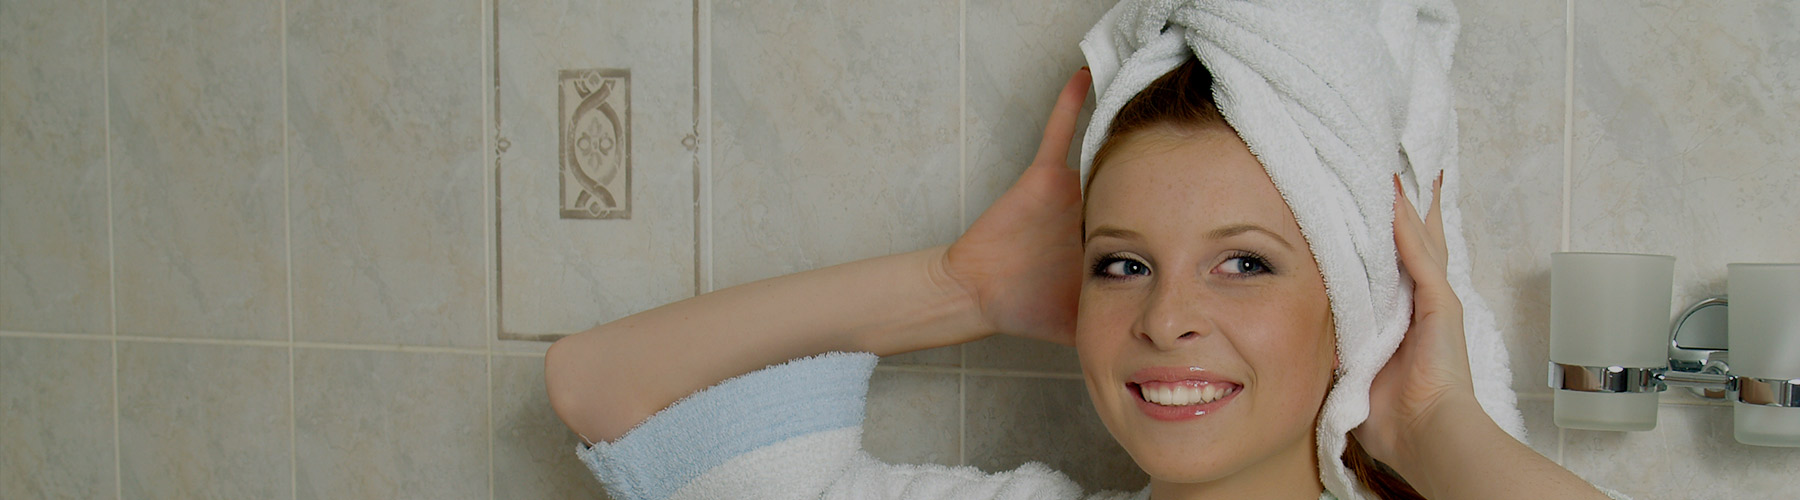 Bathroom Remodeling Clients